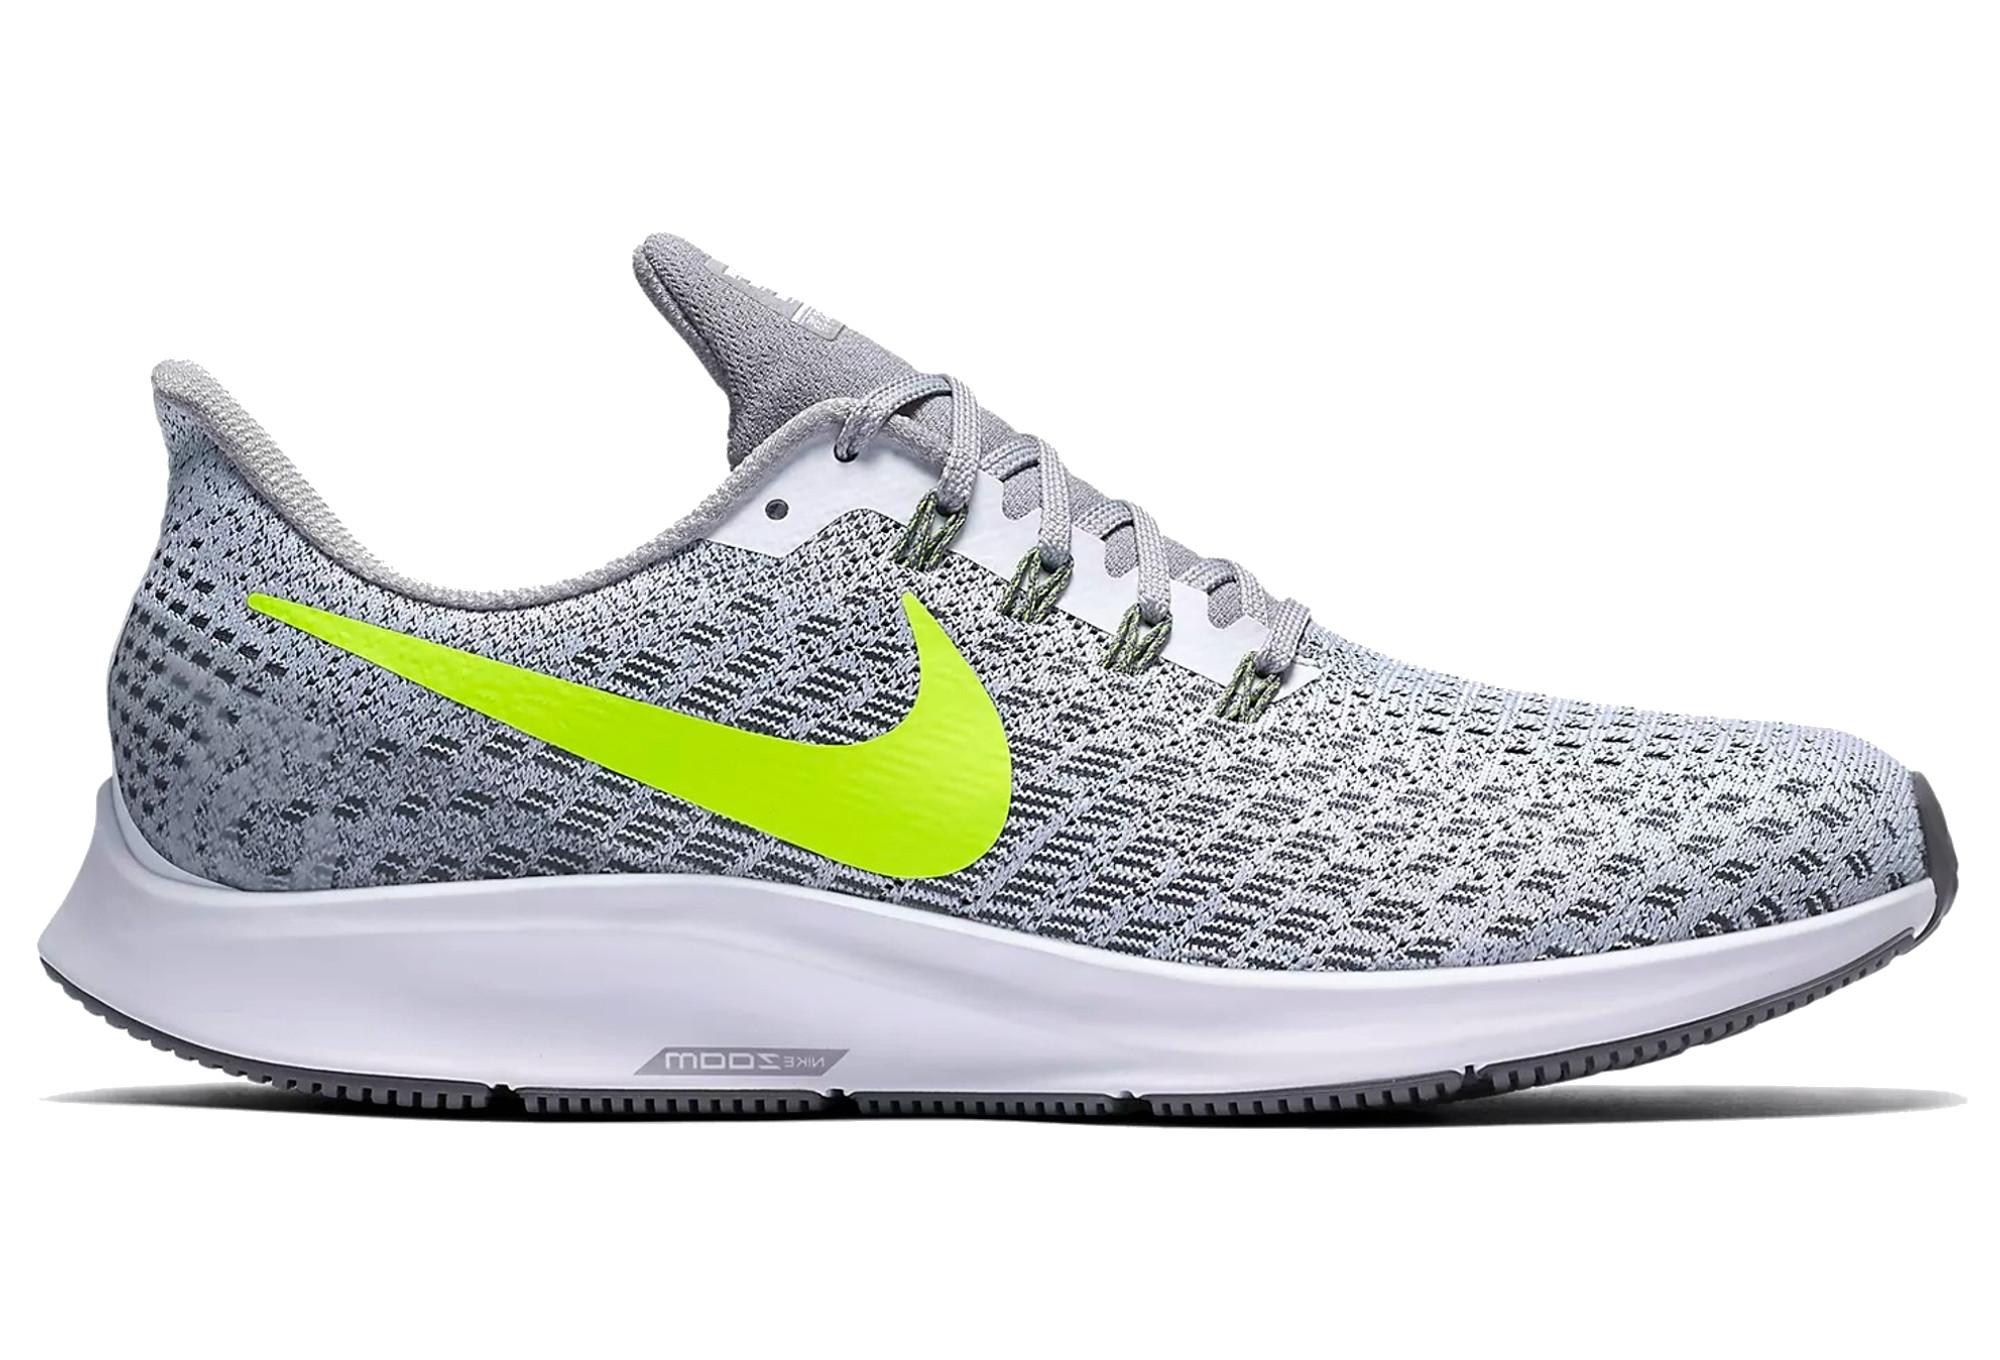 reputable site best choice uk cheap sale Nike Air Zoom Pegasus 35 Blanc Jaune Homme